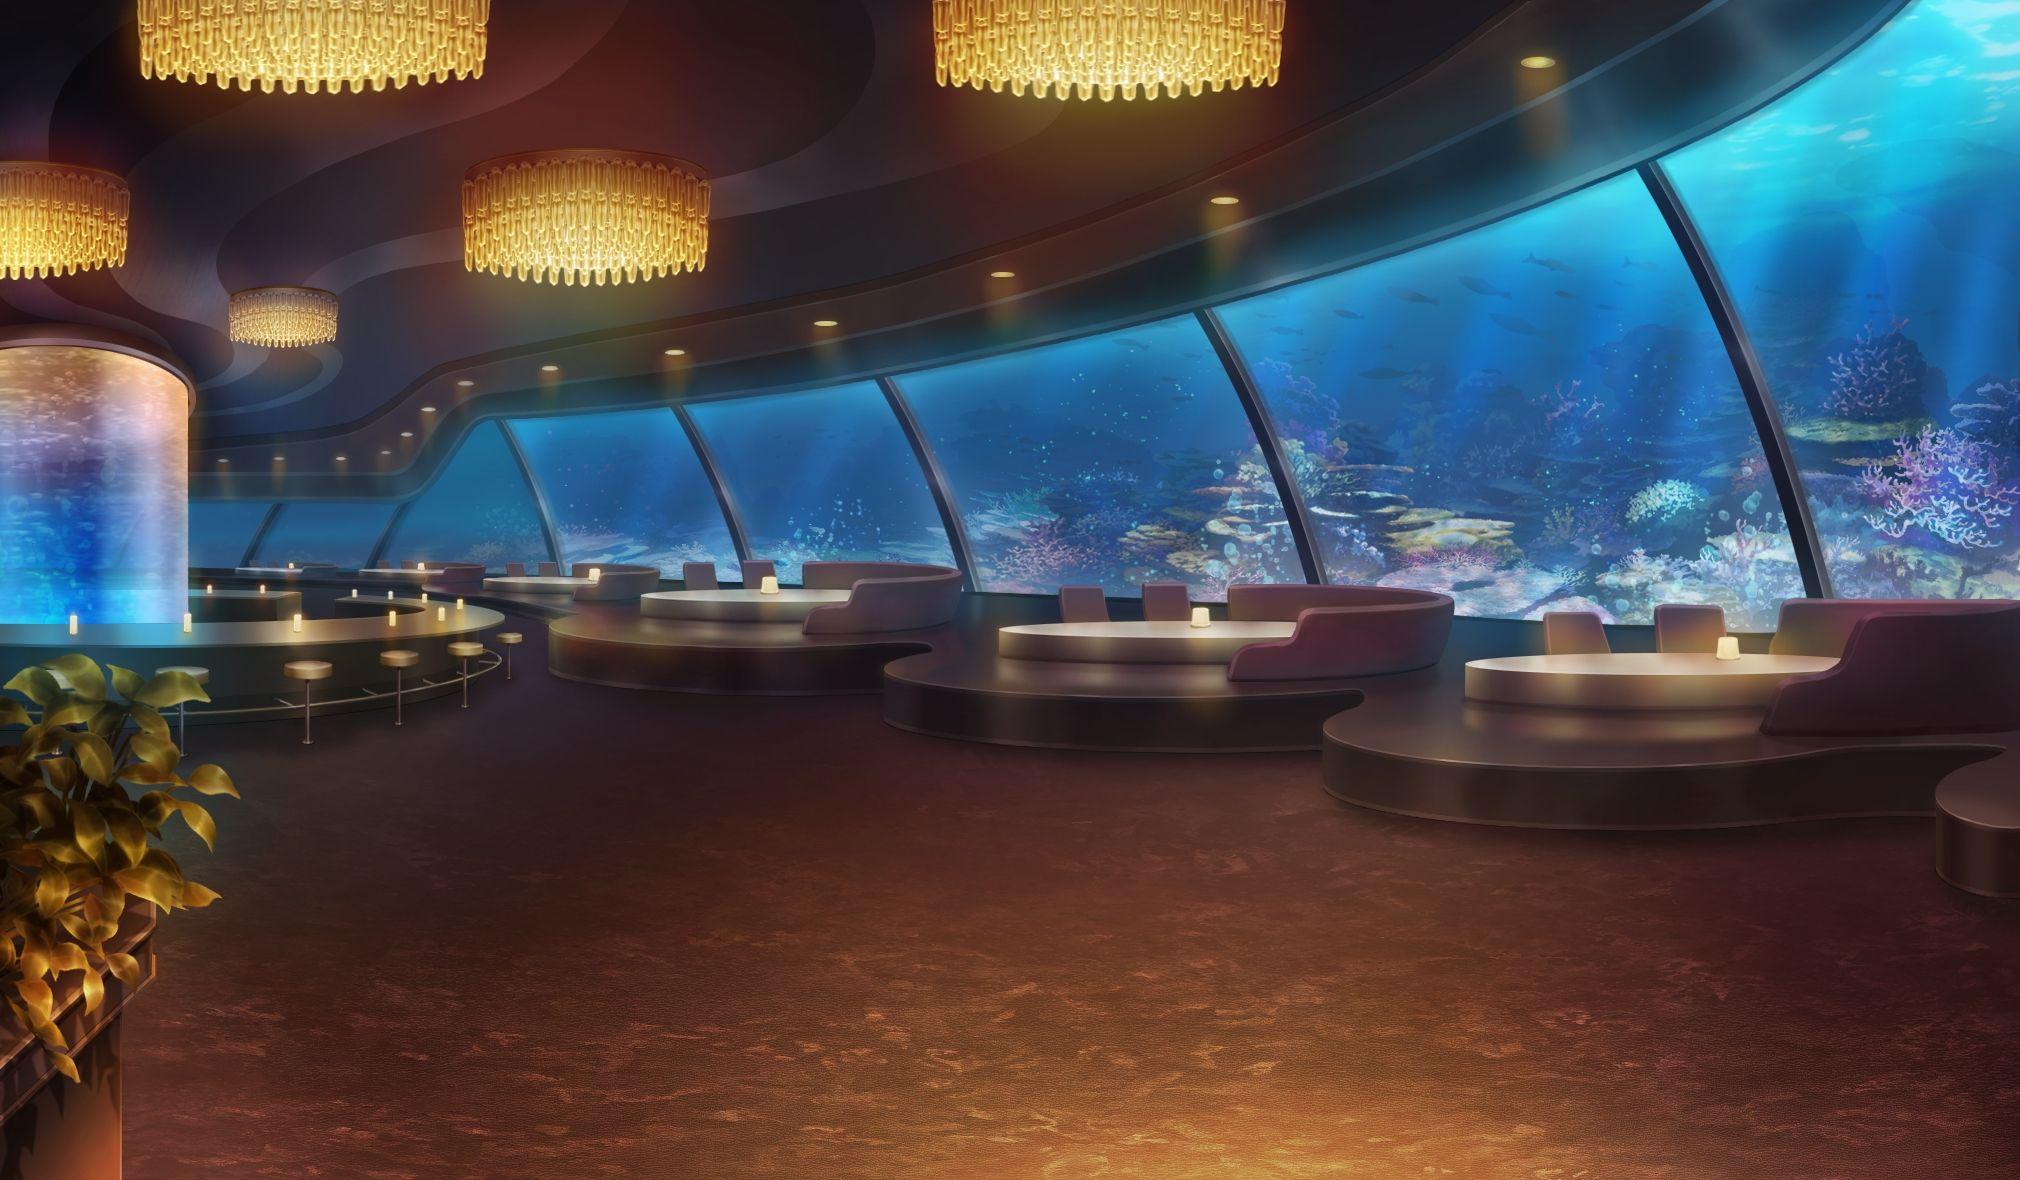 aquariumrestaurantdesktopbackground336006.jpg (2020